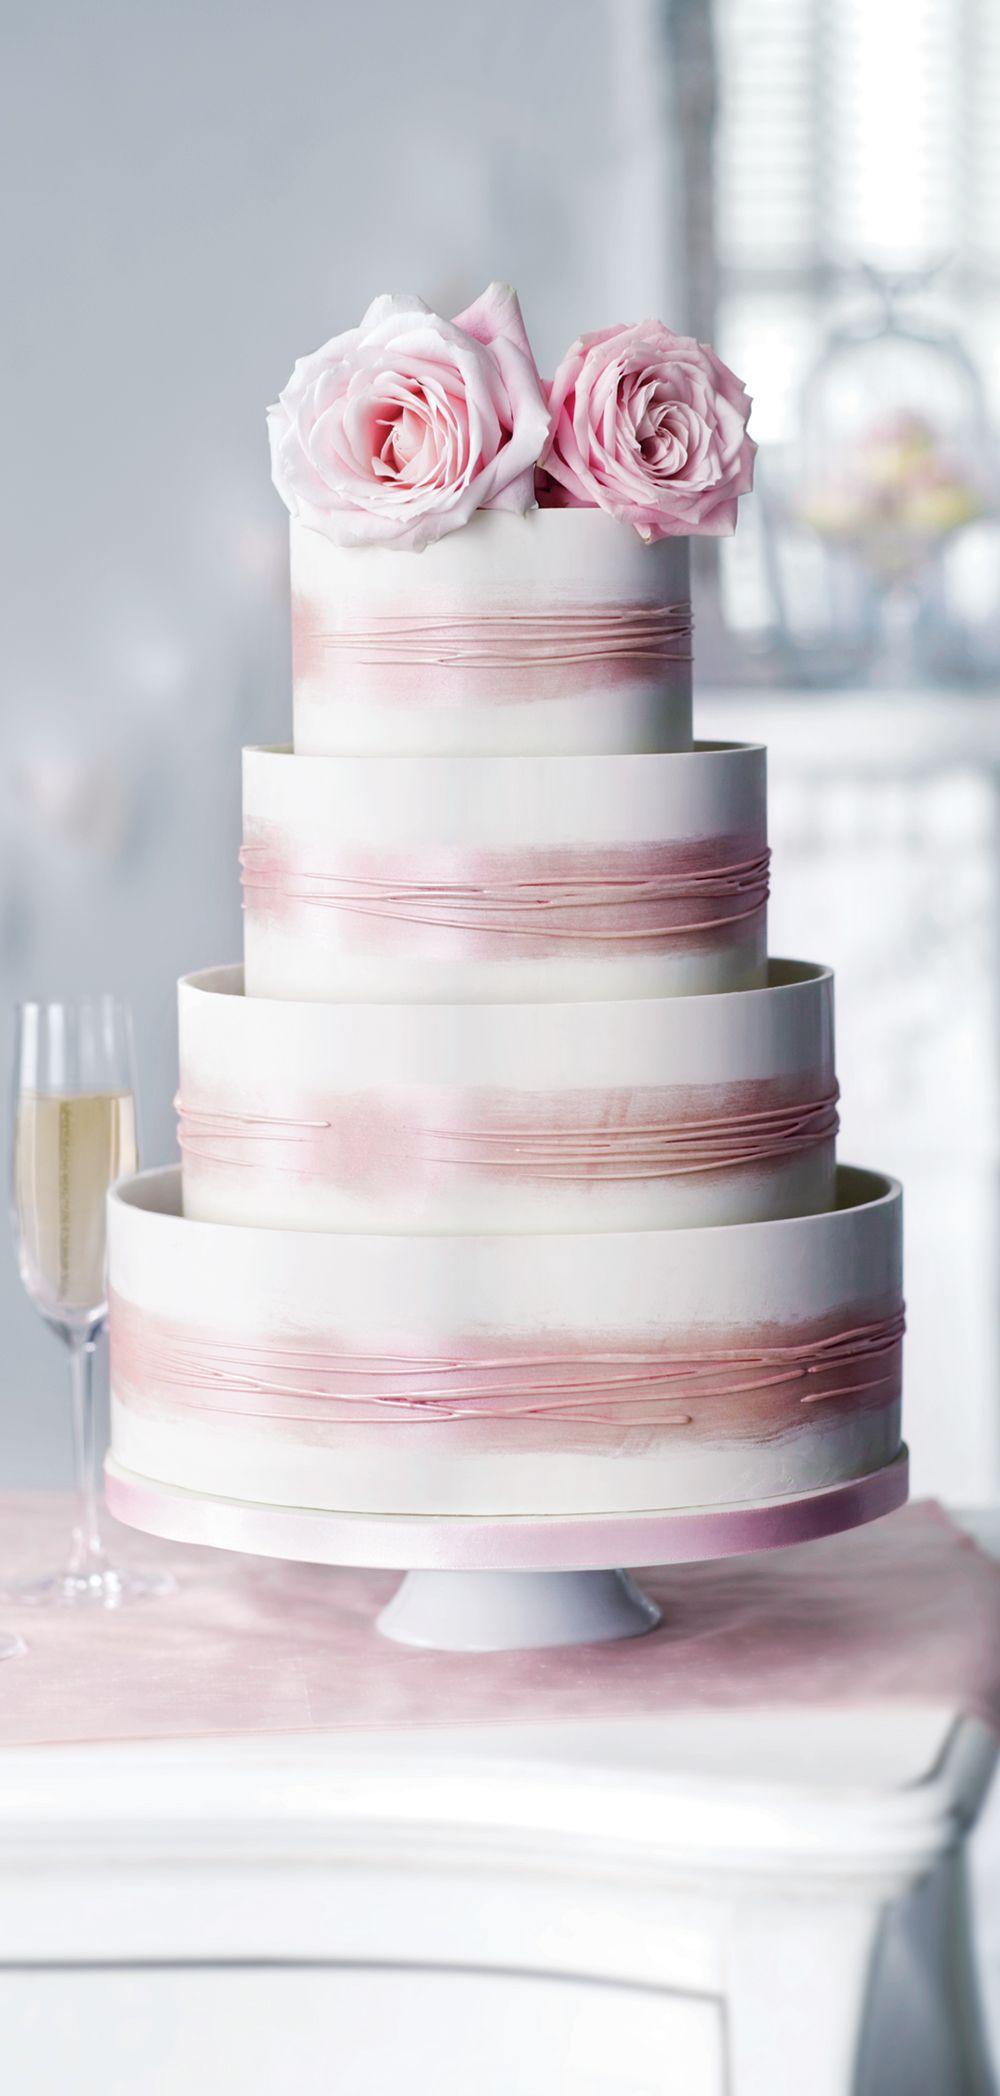 Shimmering Hoop Chocolate Wedding Cake (White & Pink) - Serves 110 ...